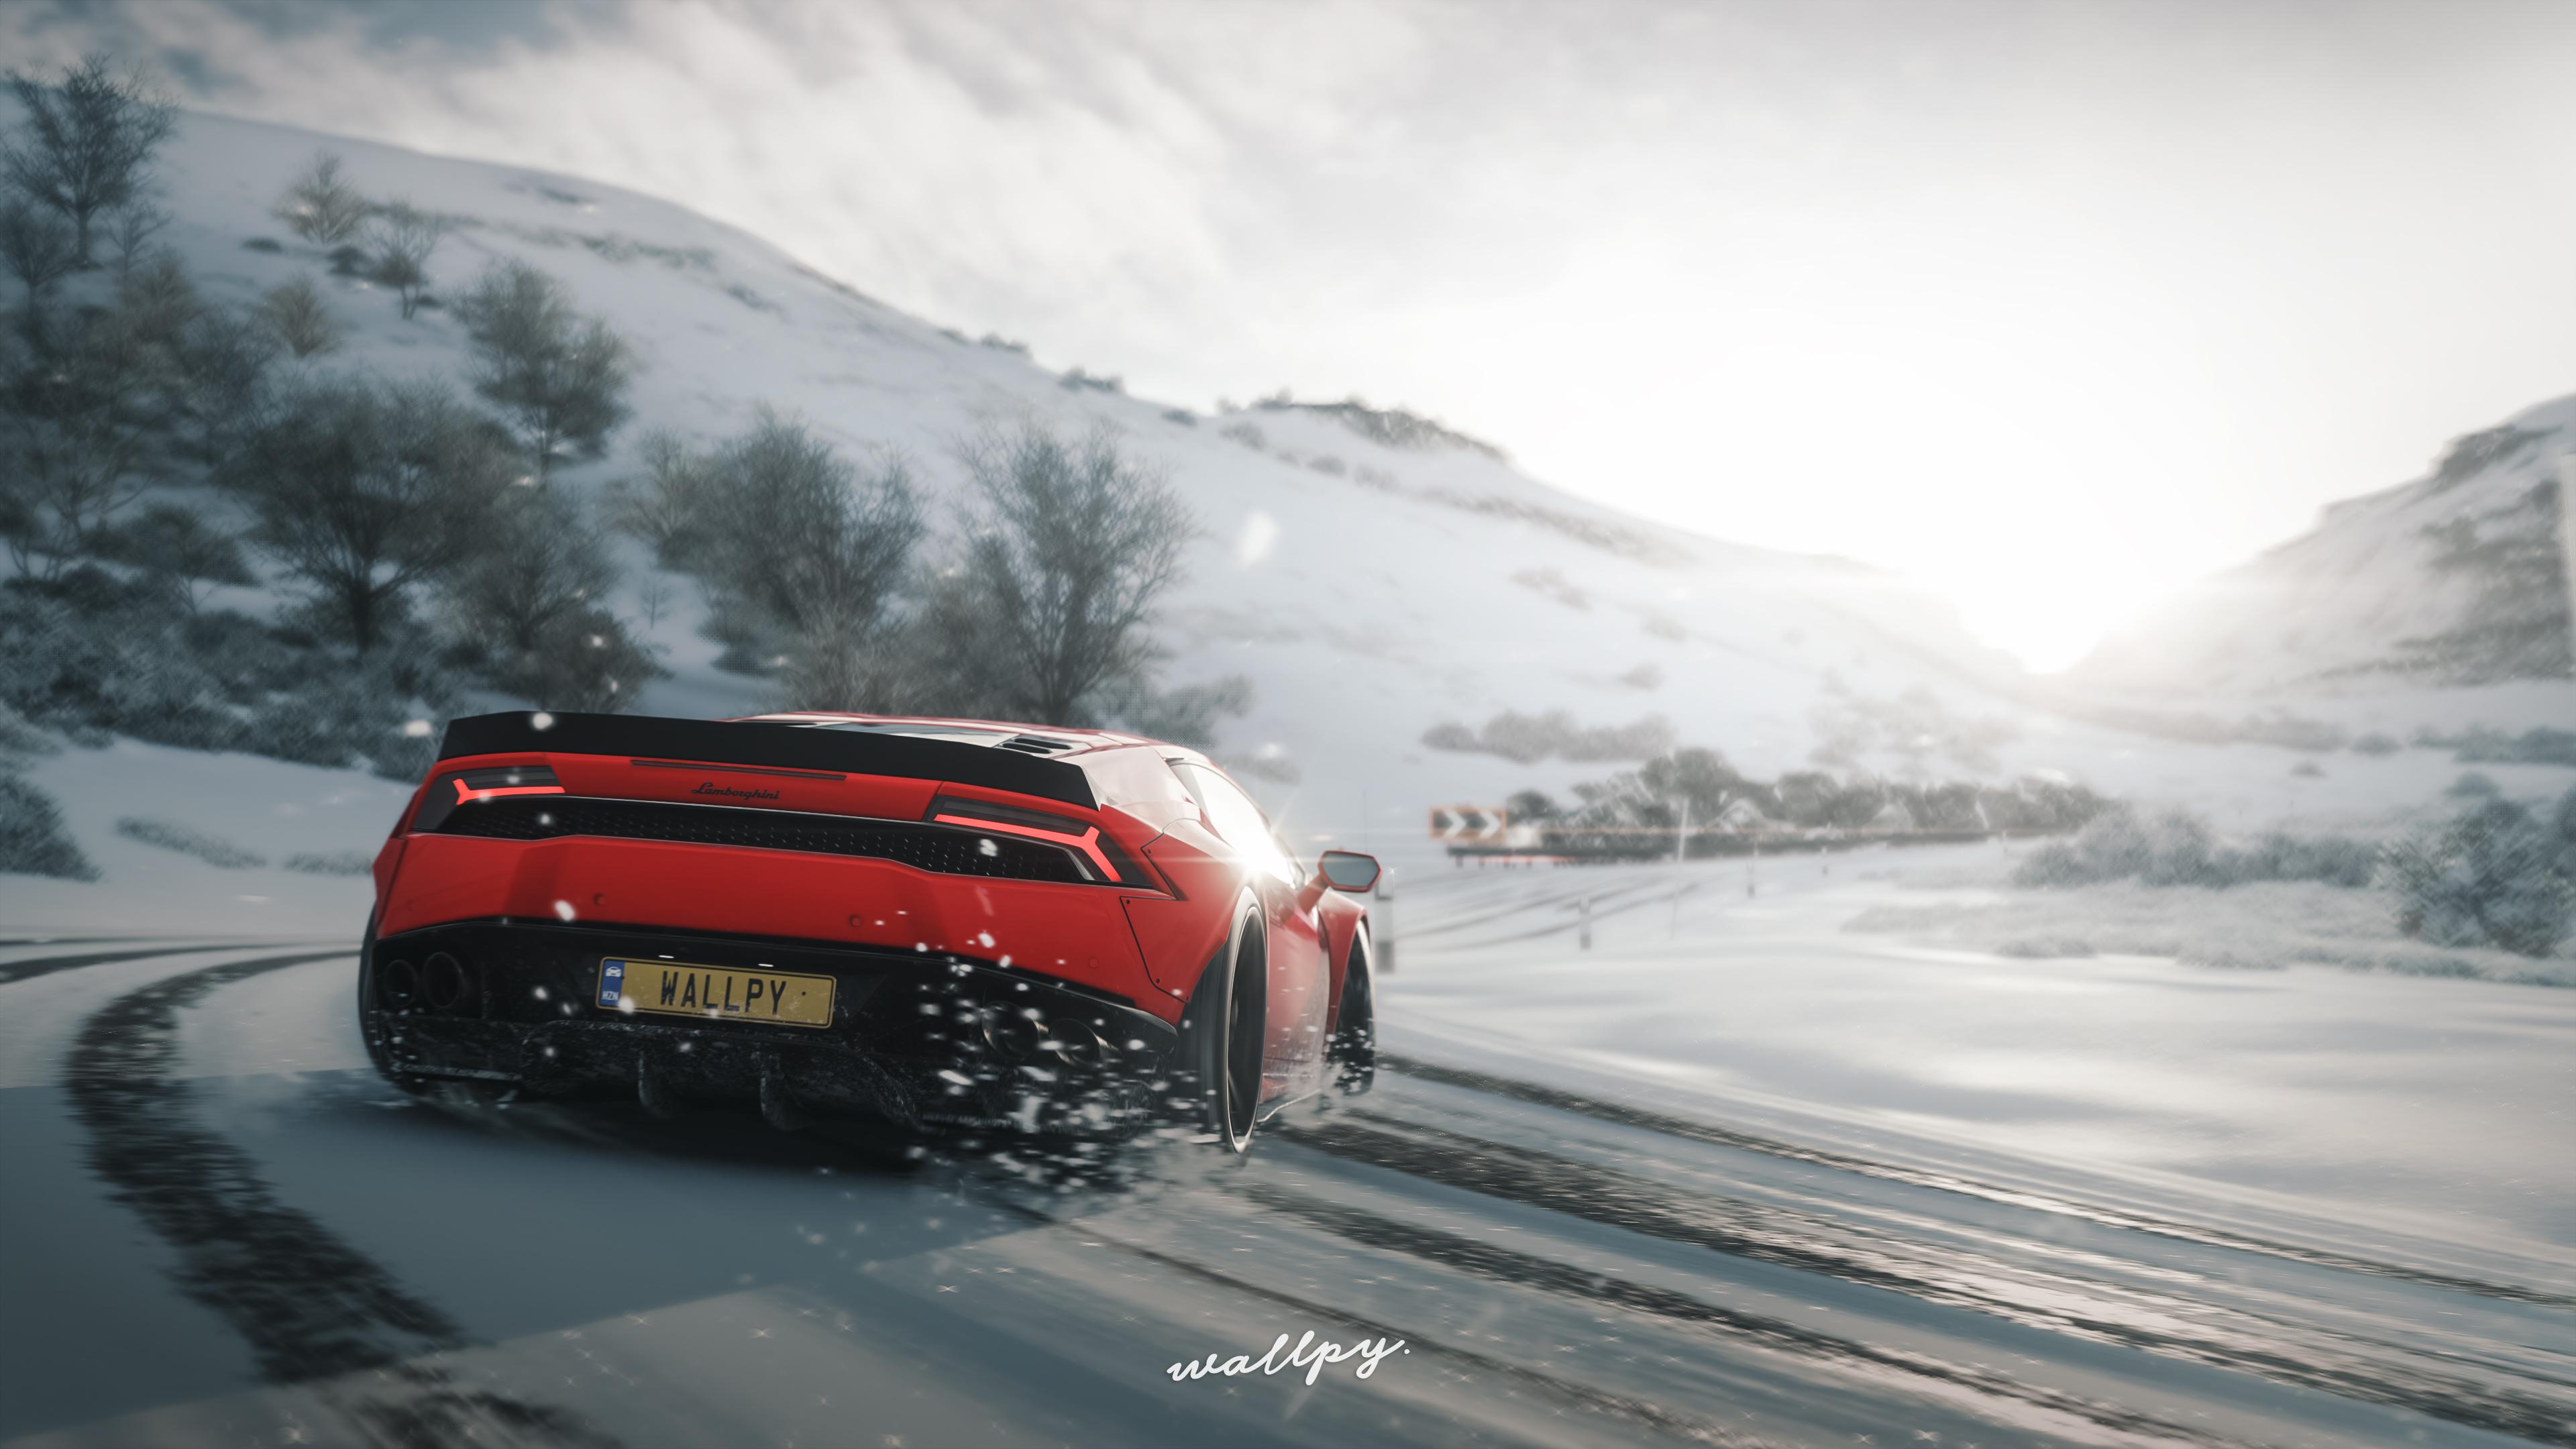 Lamborghini Huracan Drift In Snow Forza Horizon 4 ...